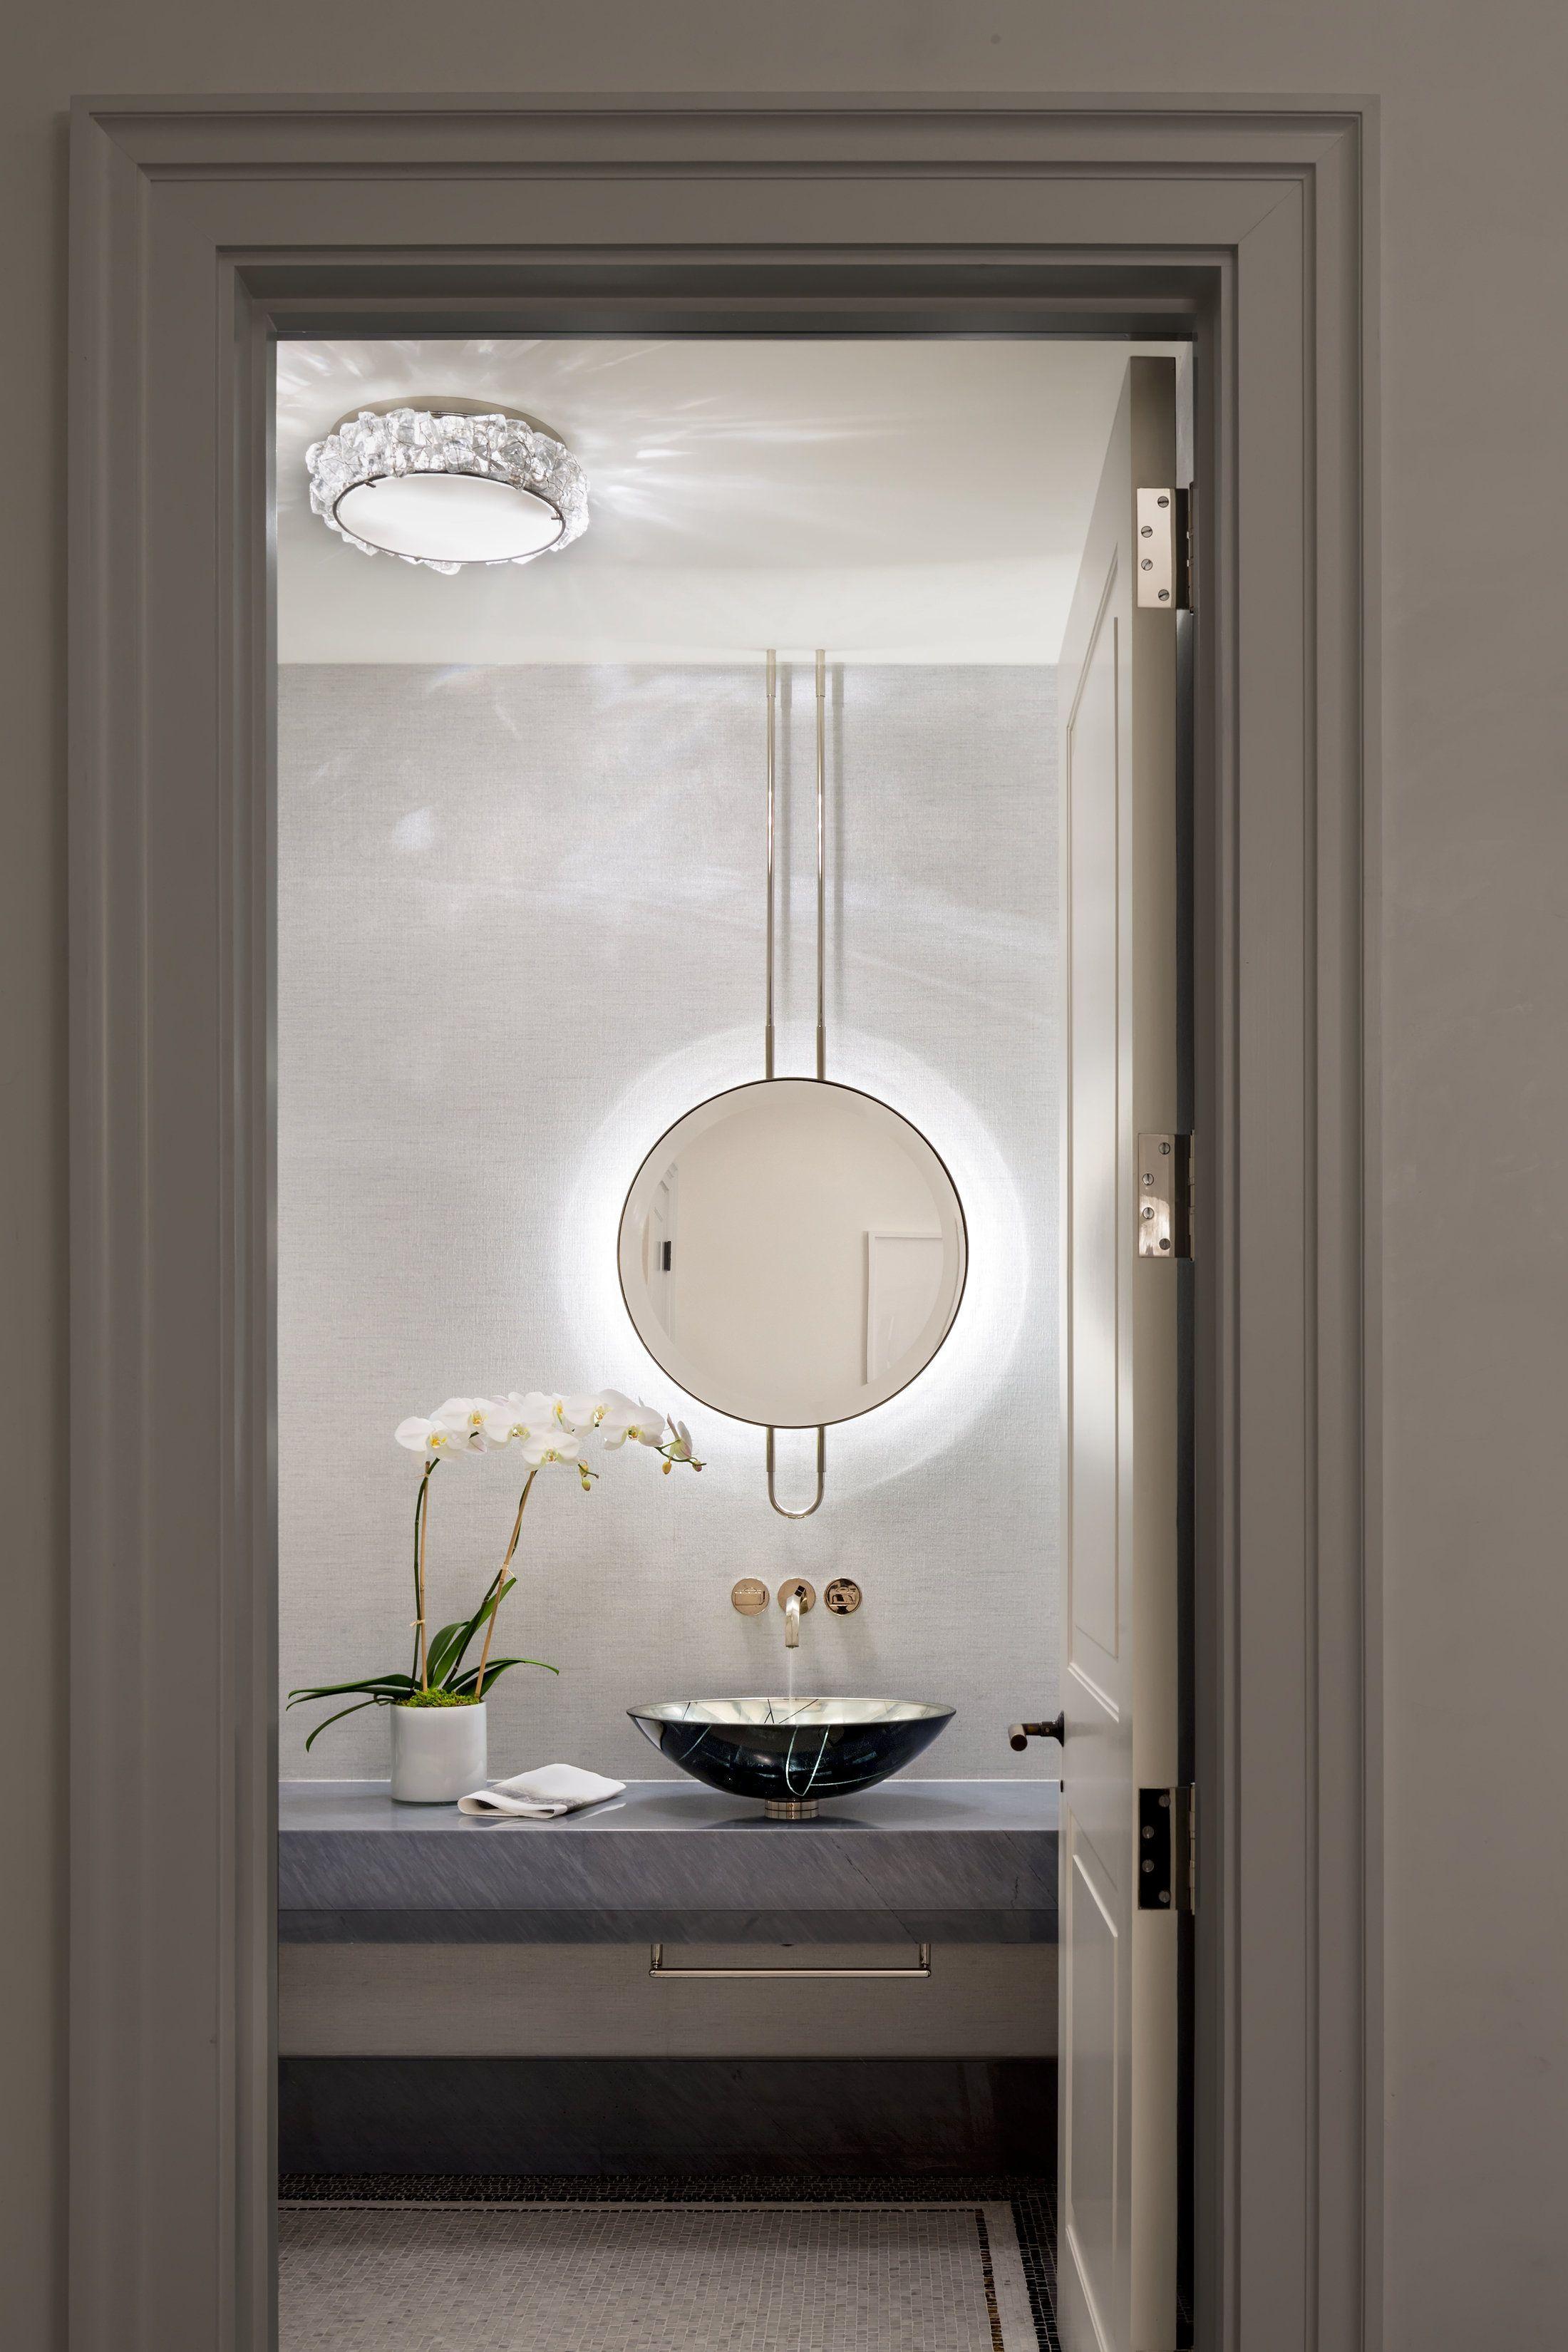 Pin by CL Hwu on Illuminated Backlit LED Round Bathroom Mirror LED ...